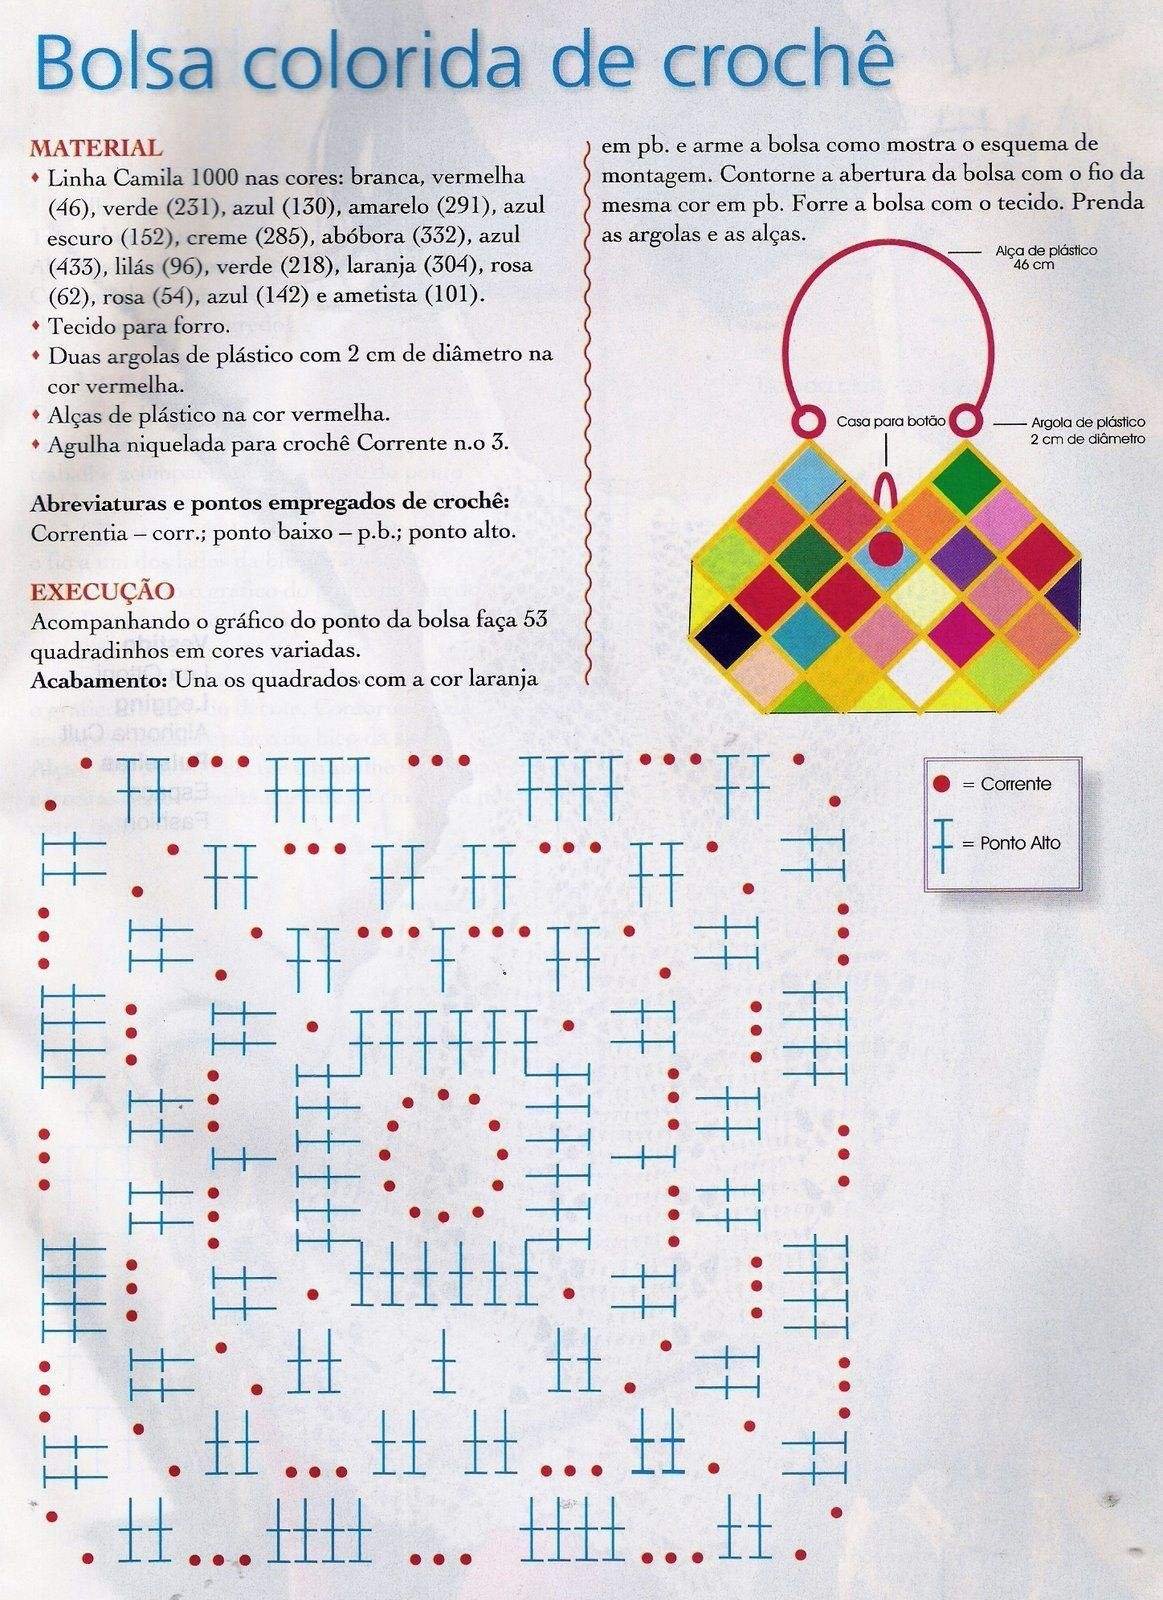 Patrones Crochet: Bolso Cuadros-Rombos Crochet Patron | Hilos ...